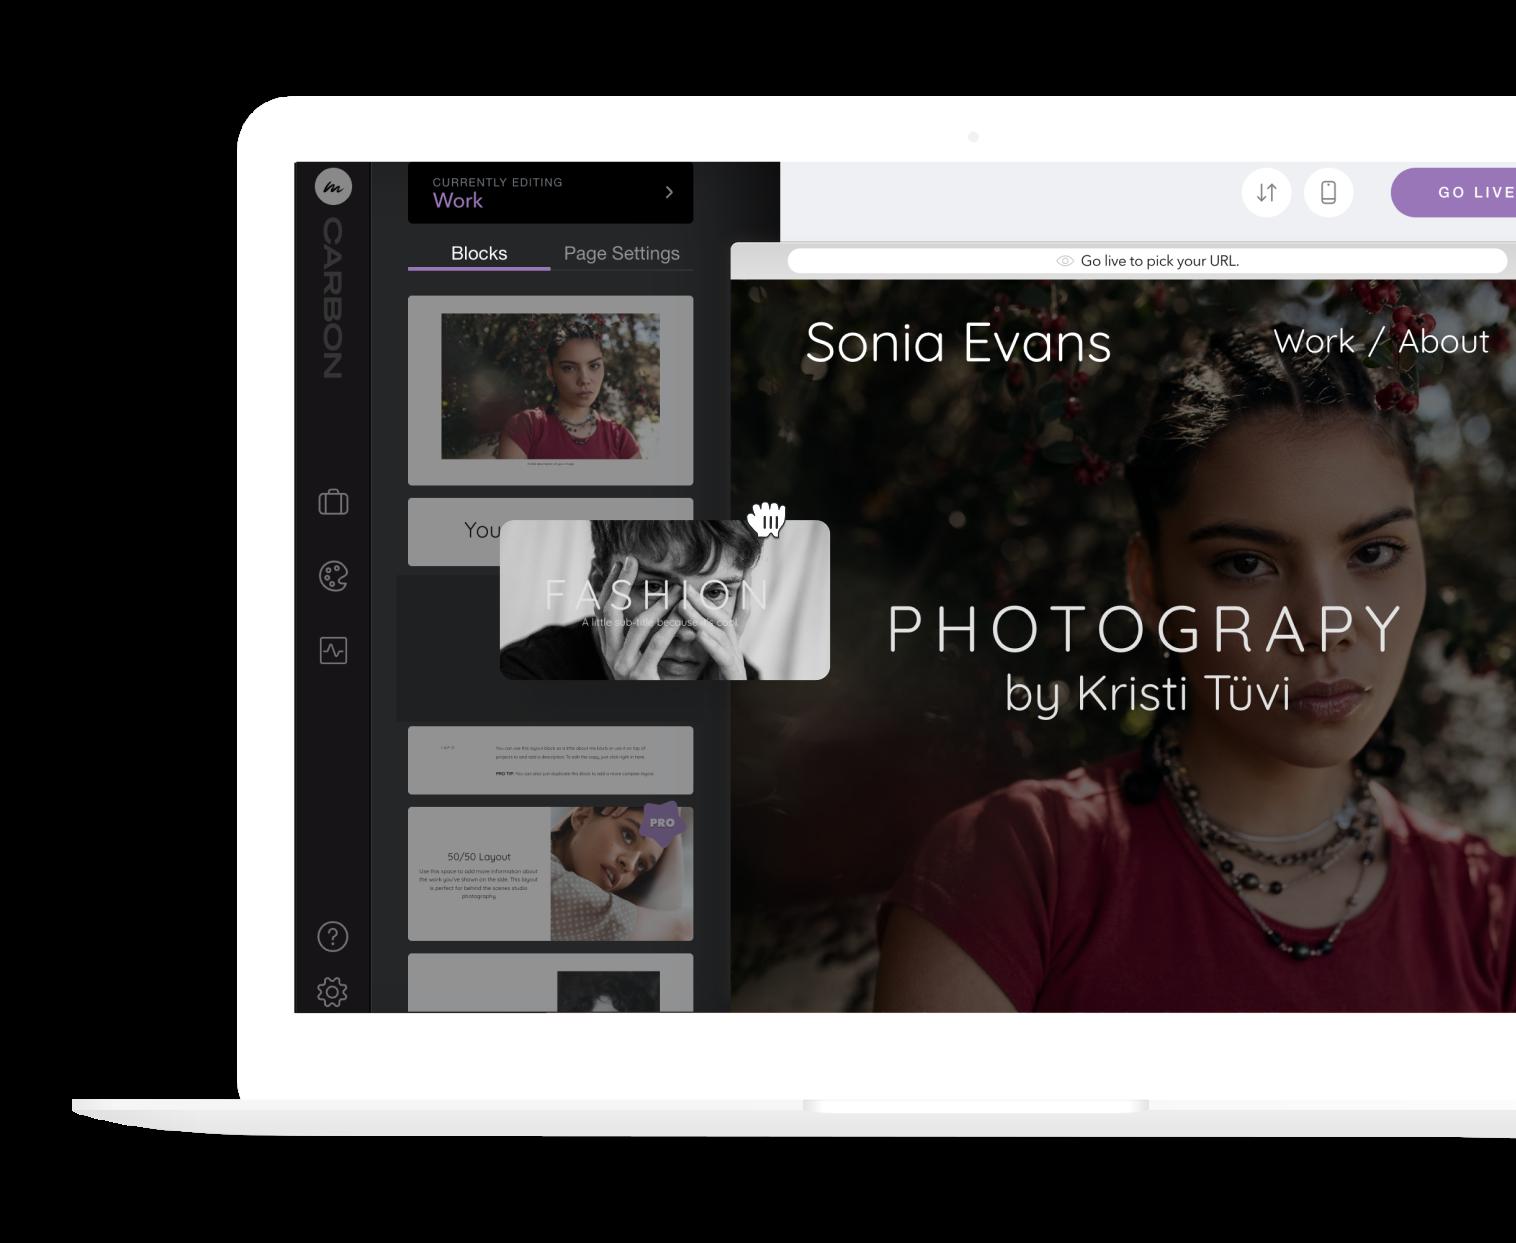 c4-photography-laptop